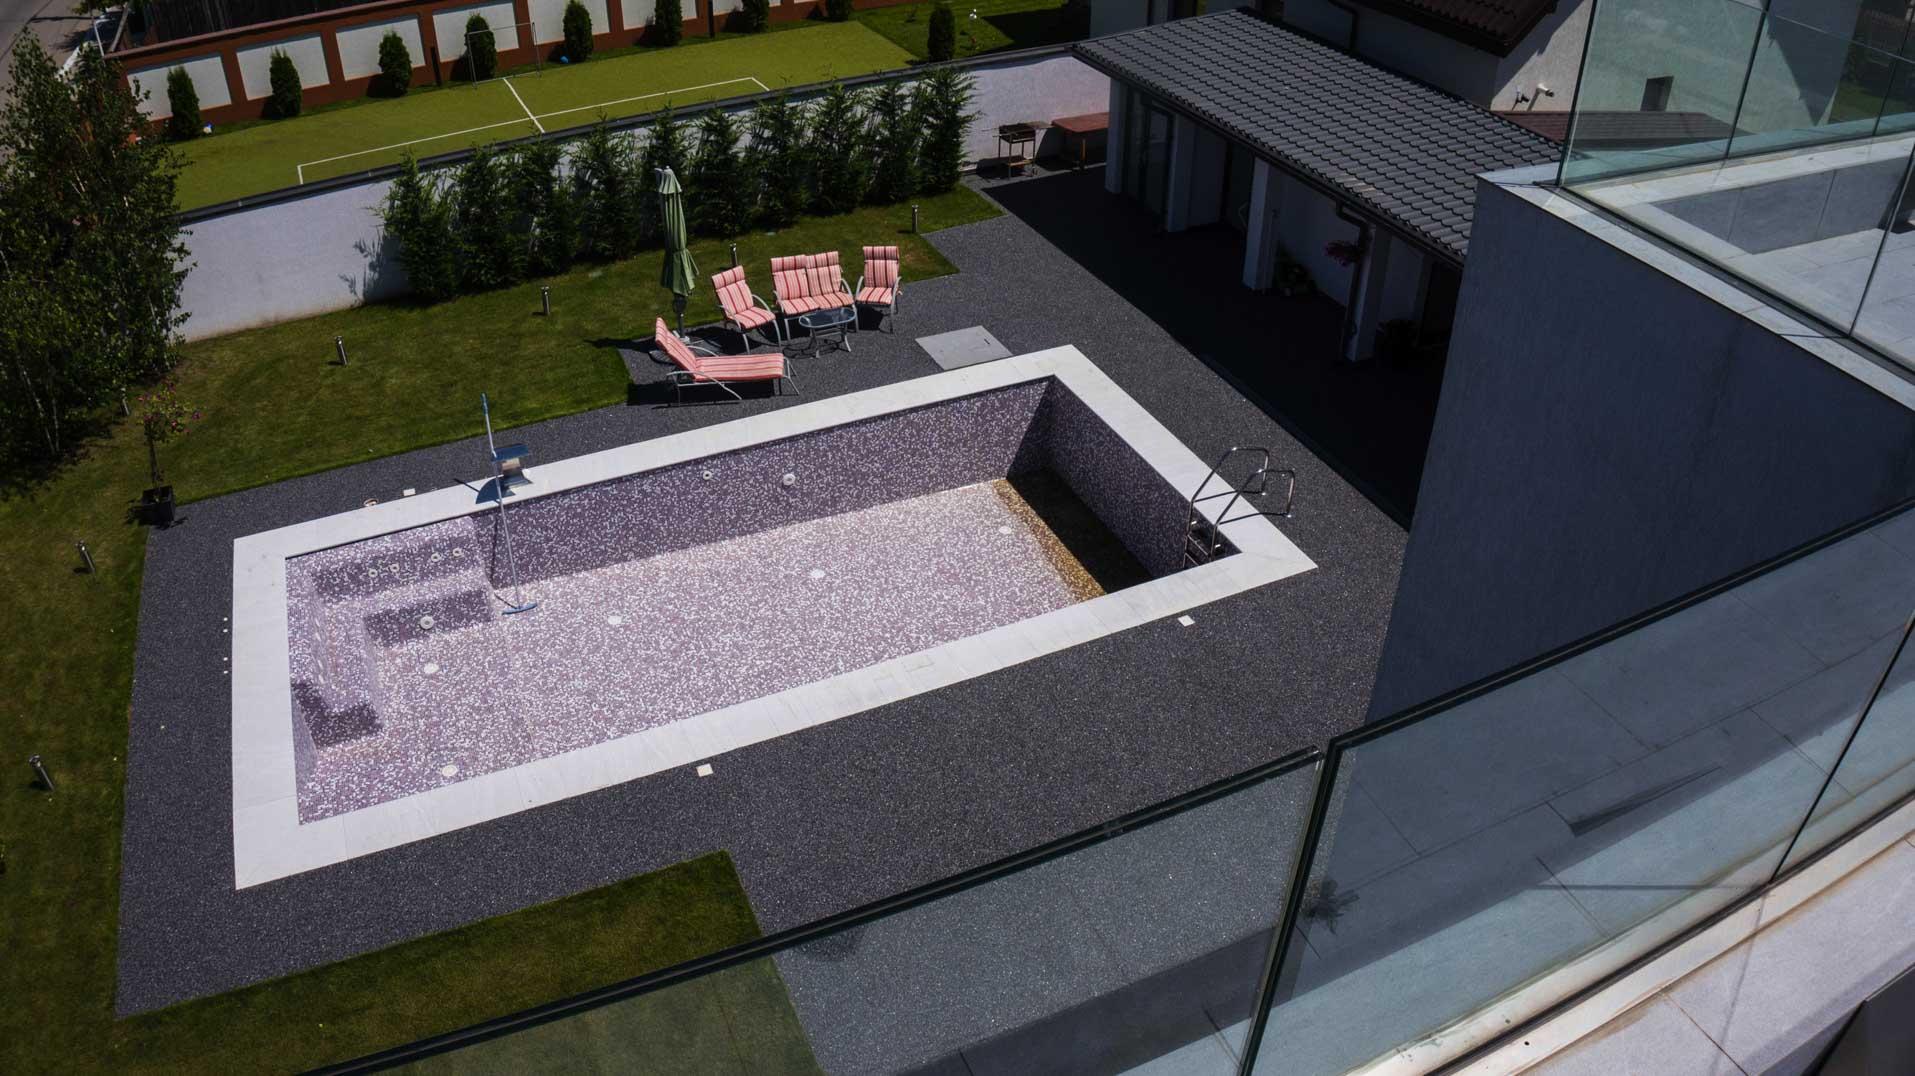 viarustik-stone-carpet-pool